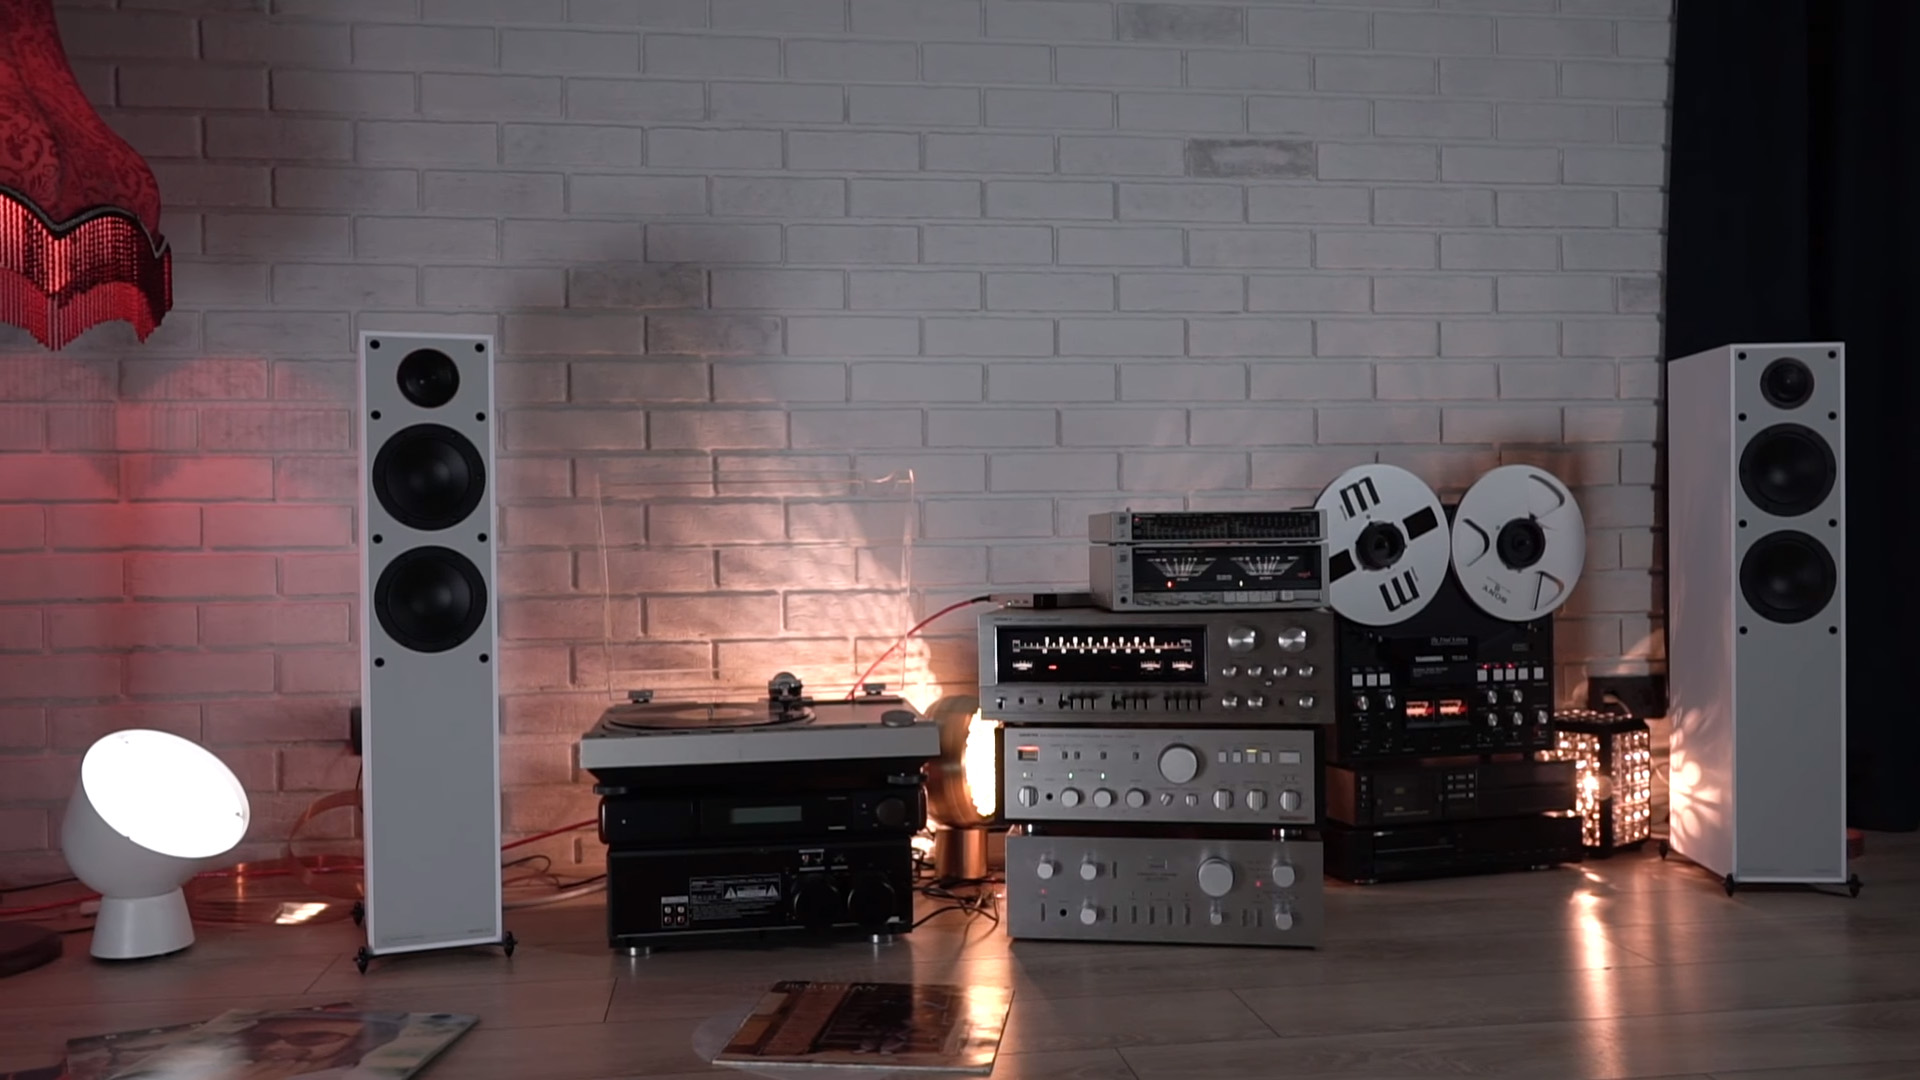 Borzenkov нашёл лучшее применение колонкам Monitor Audio Monitor 200 Black Edition